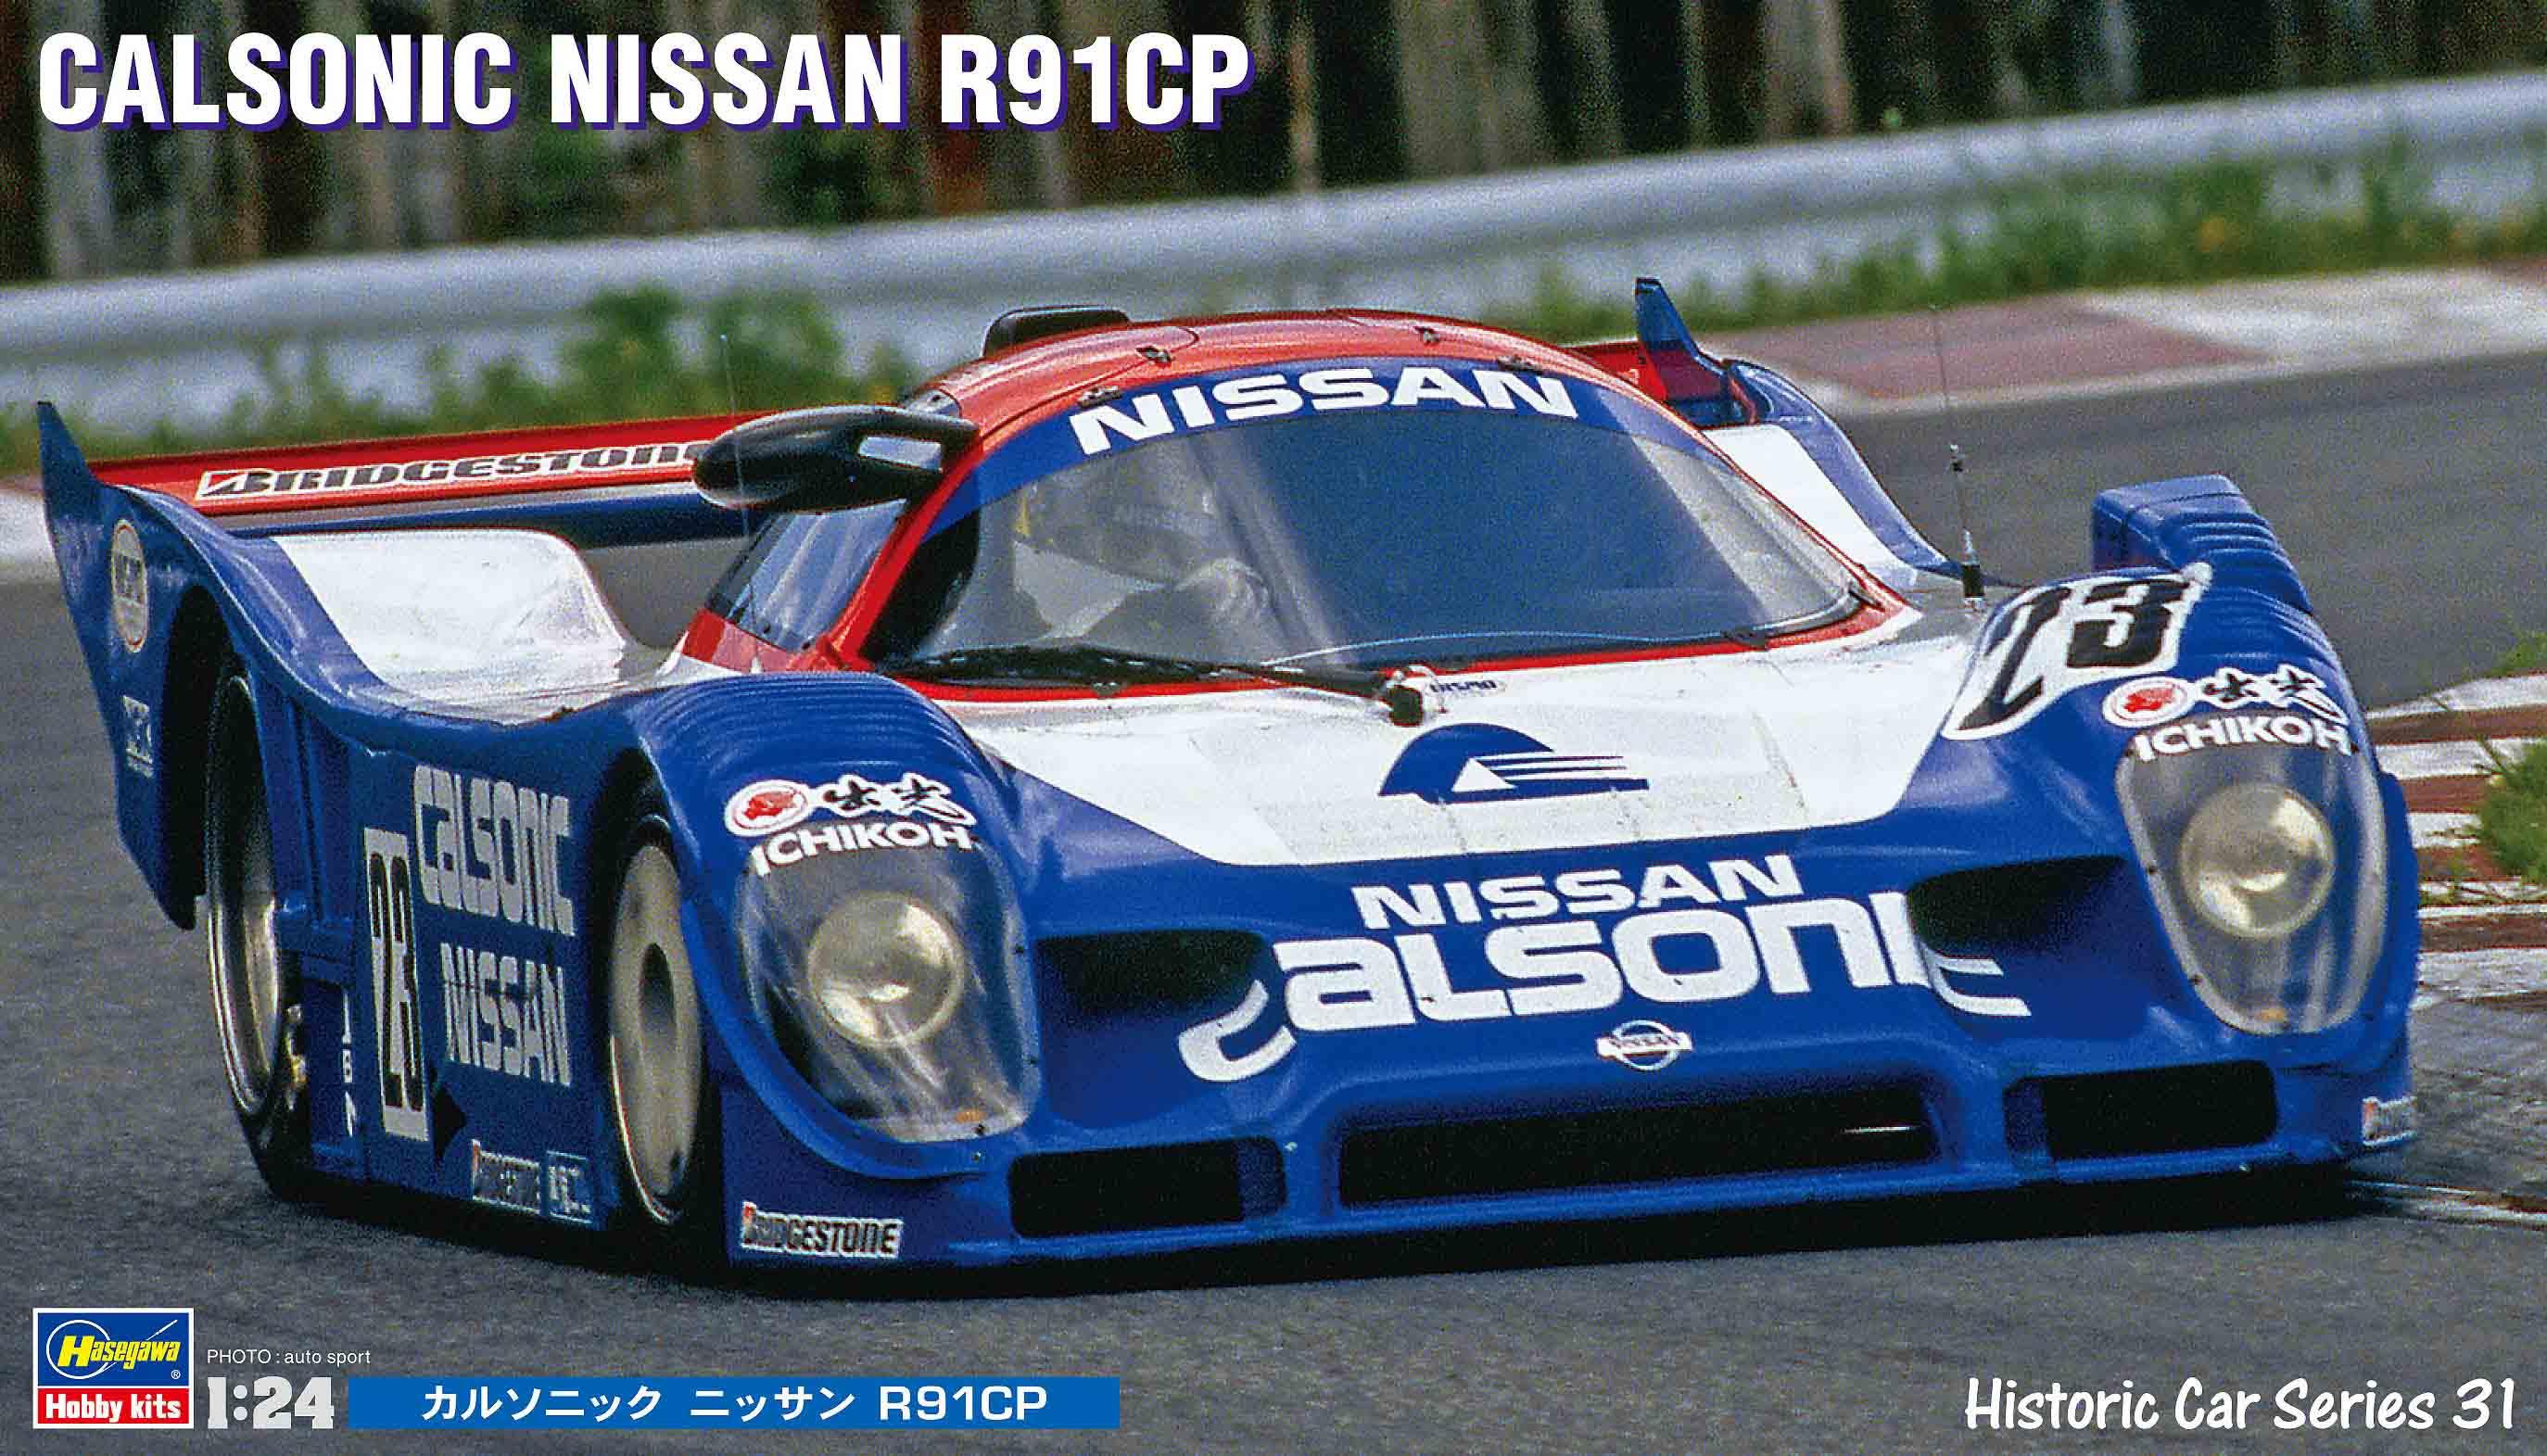 Hasegawa Calsonic Nissan R91Cp